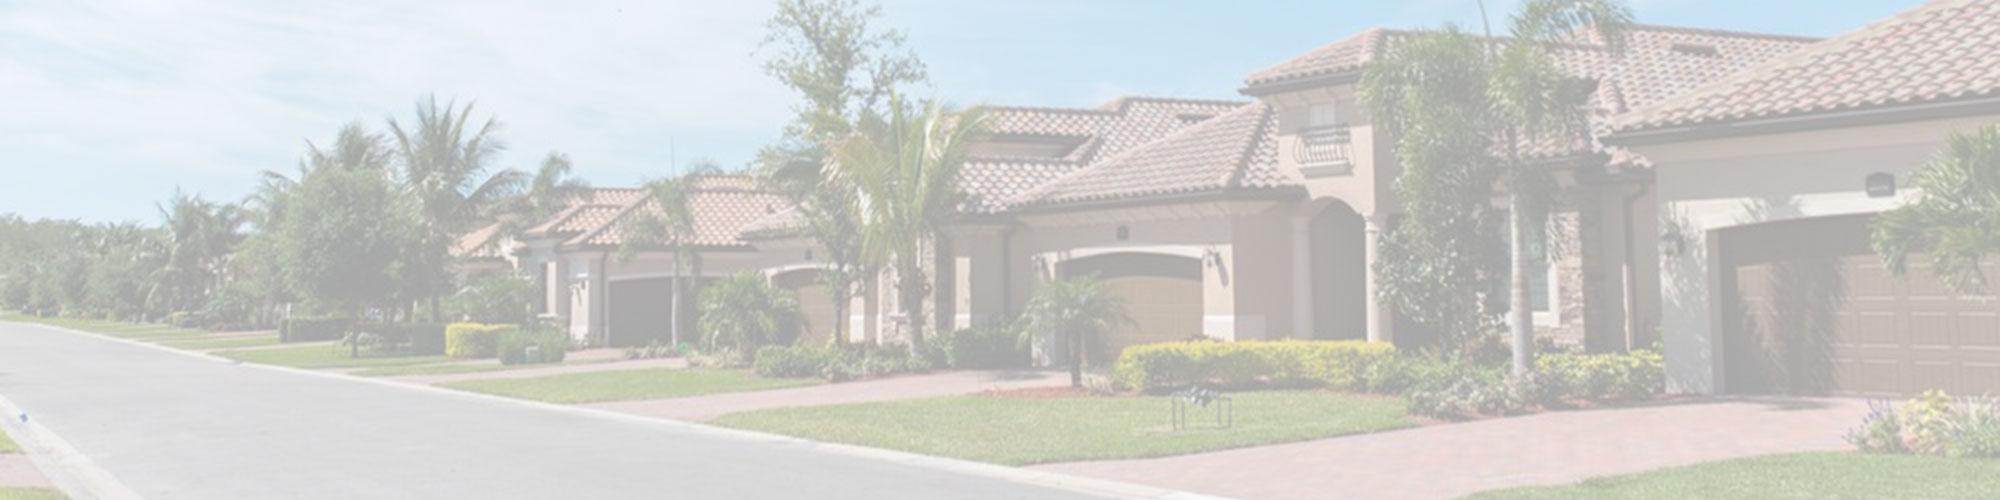 J&L Property Management